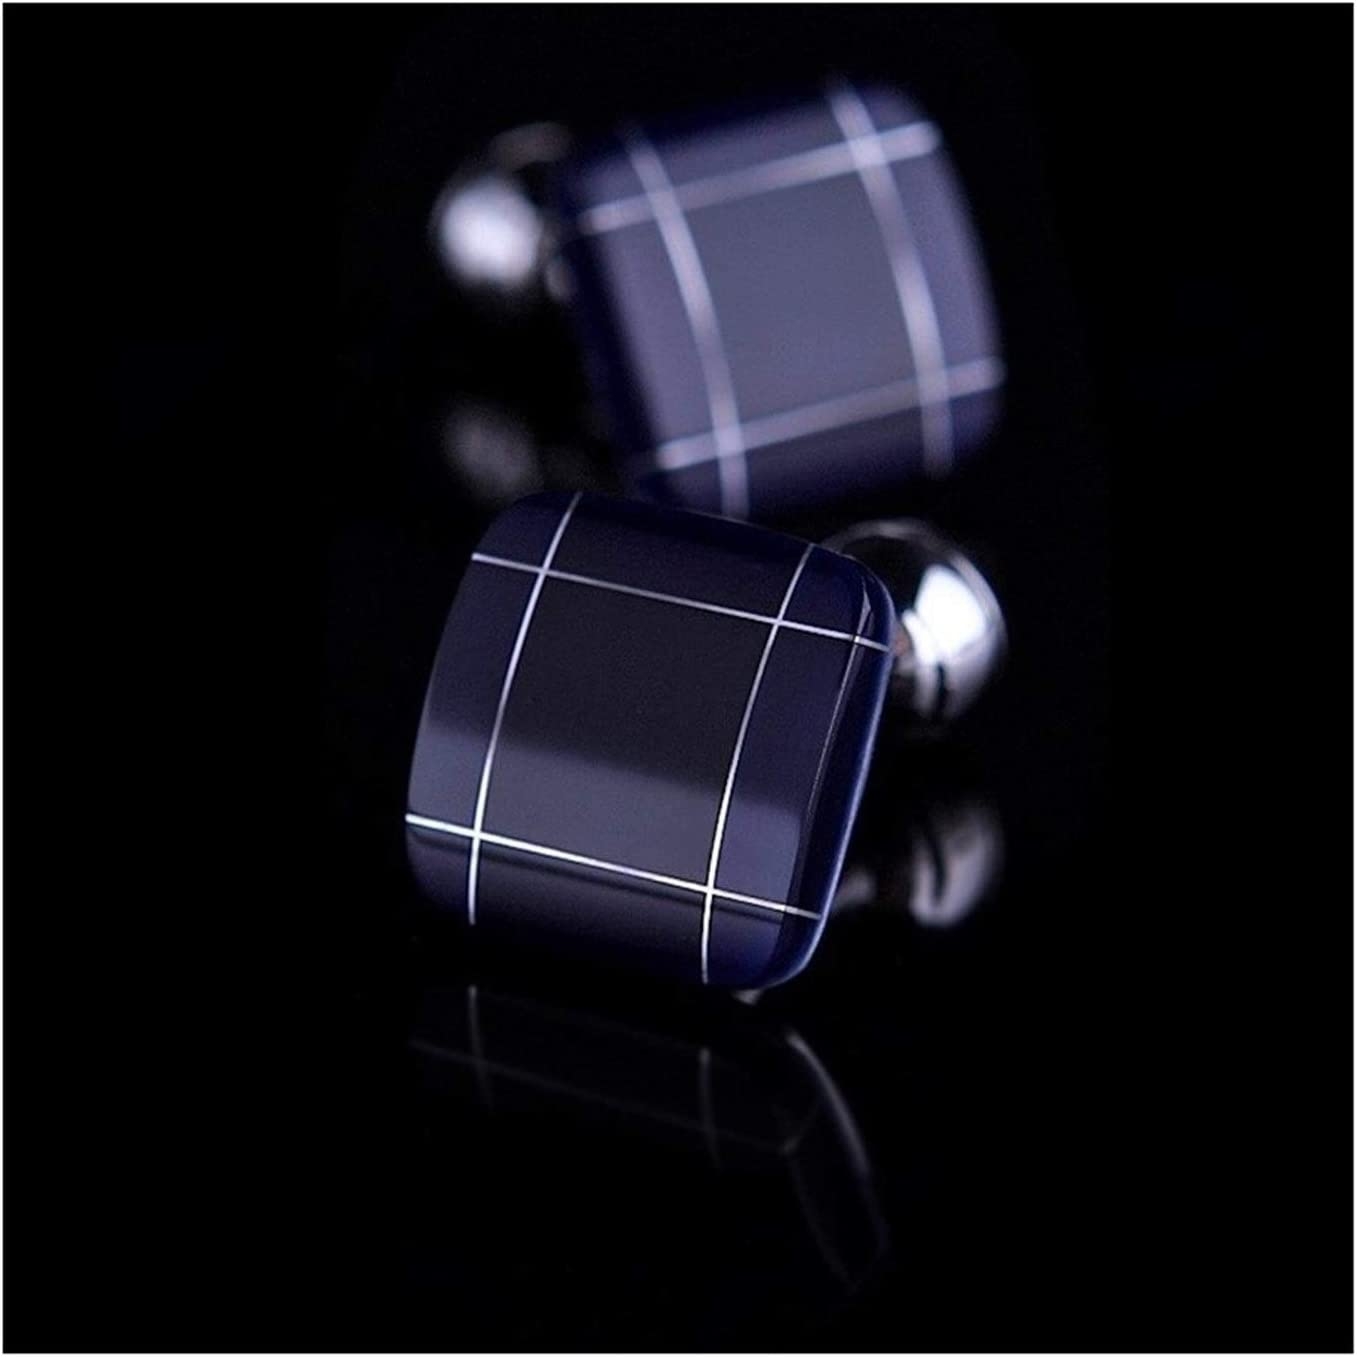 SDSF Japan Maker New Max 71% OFF Fashion Jewelry Gift Cufflinks B Men's Shirt Blue